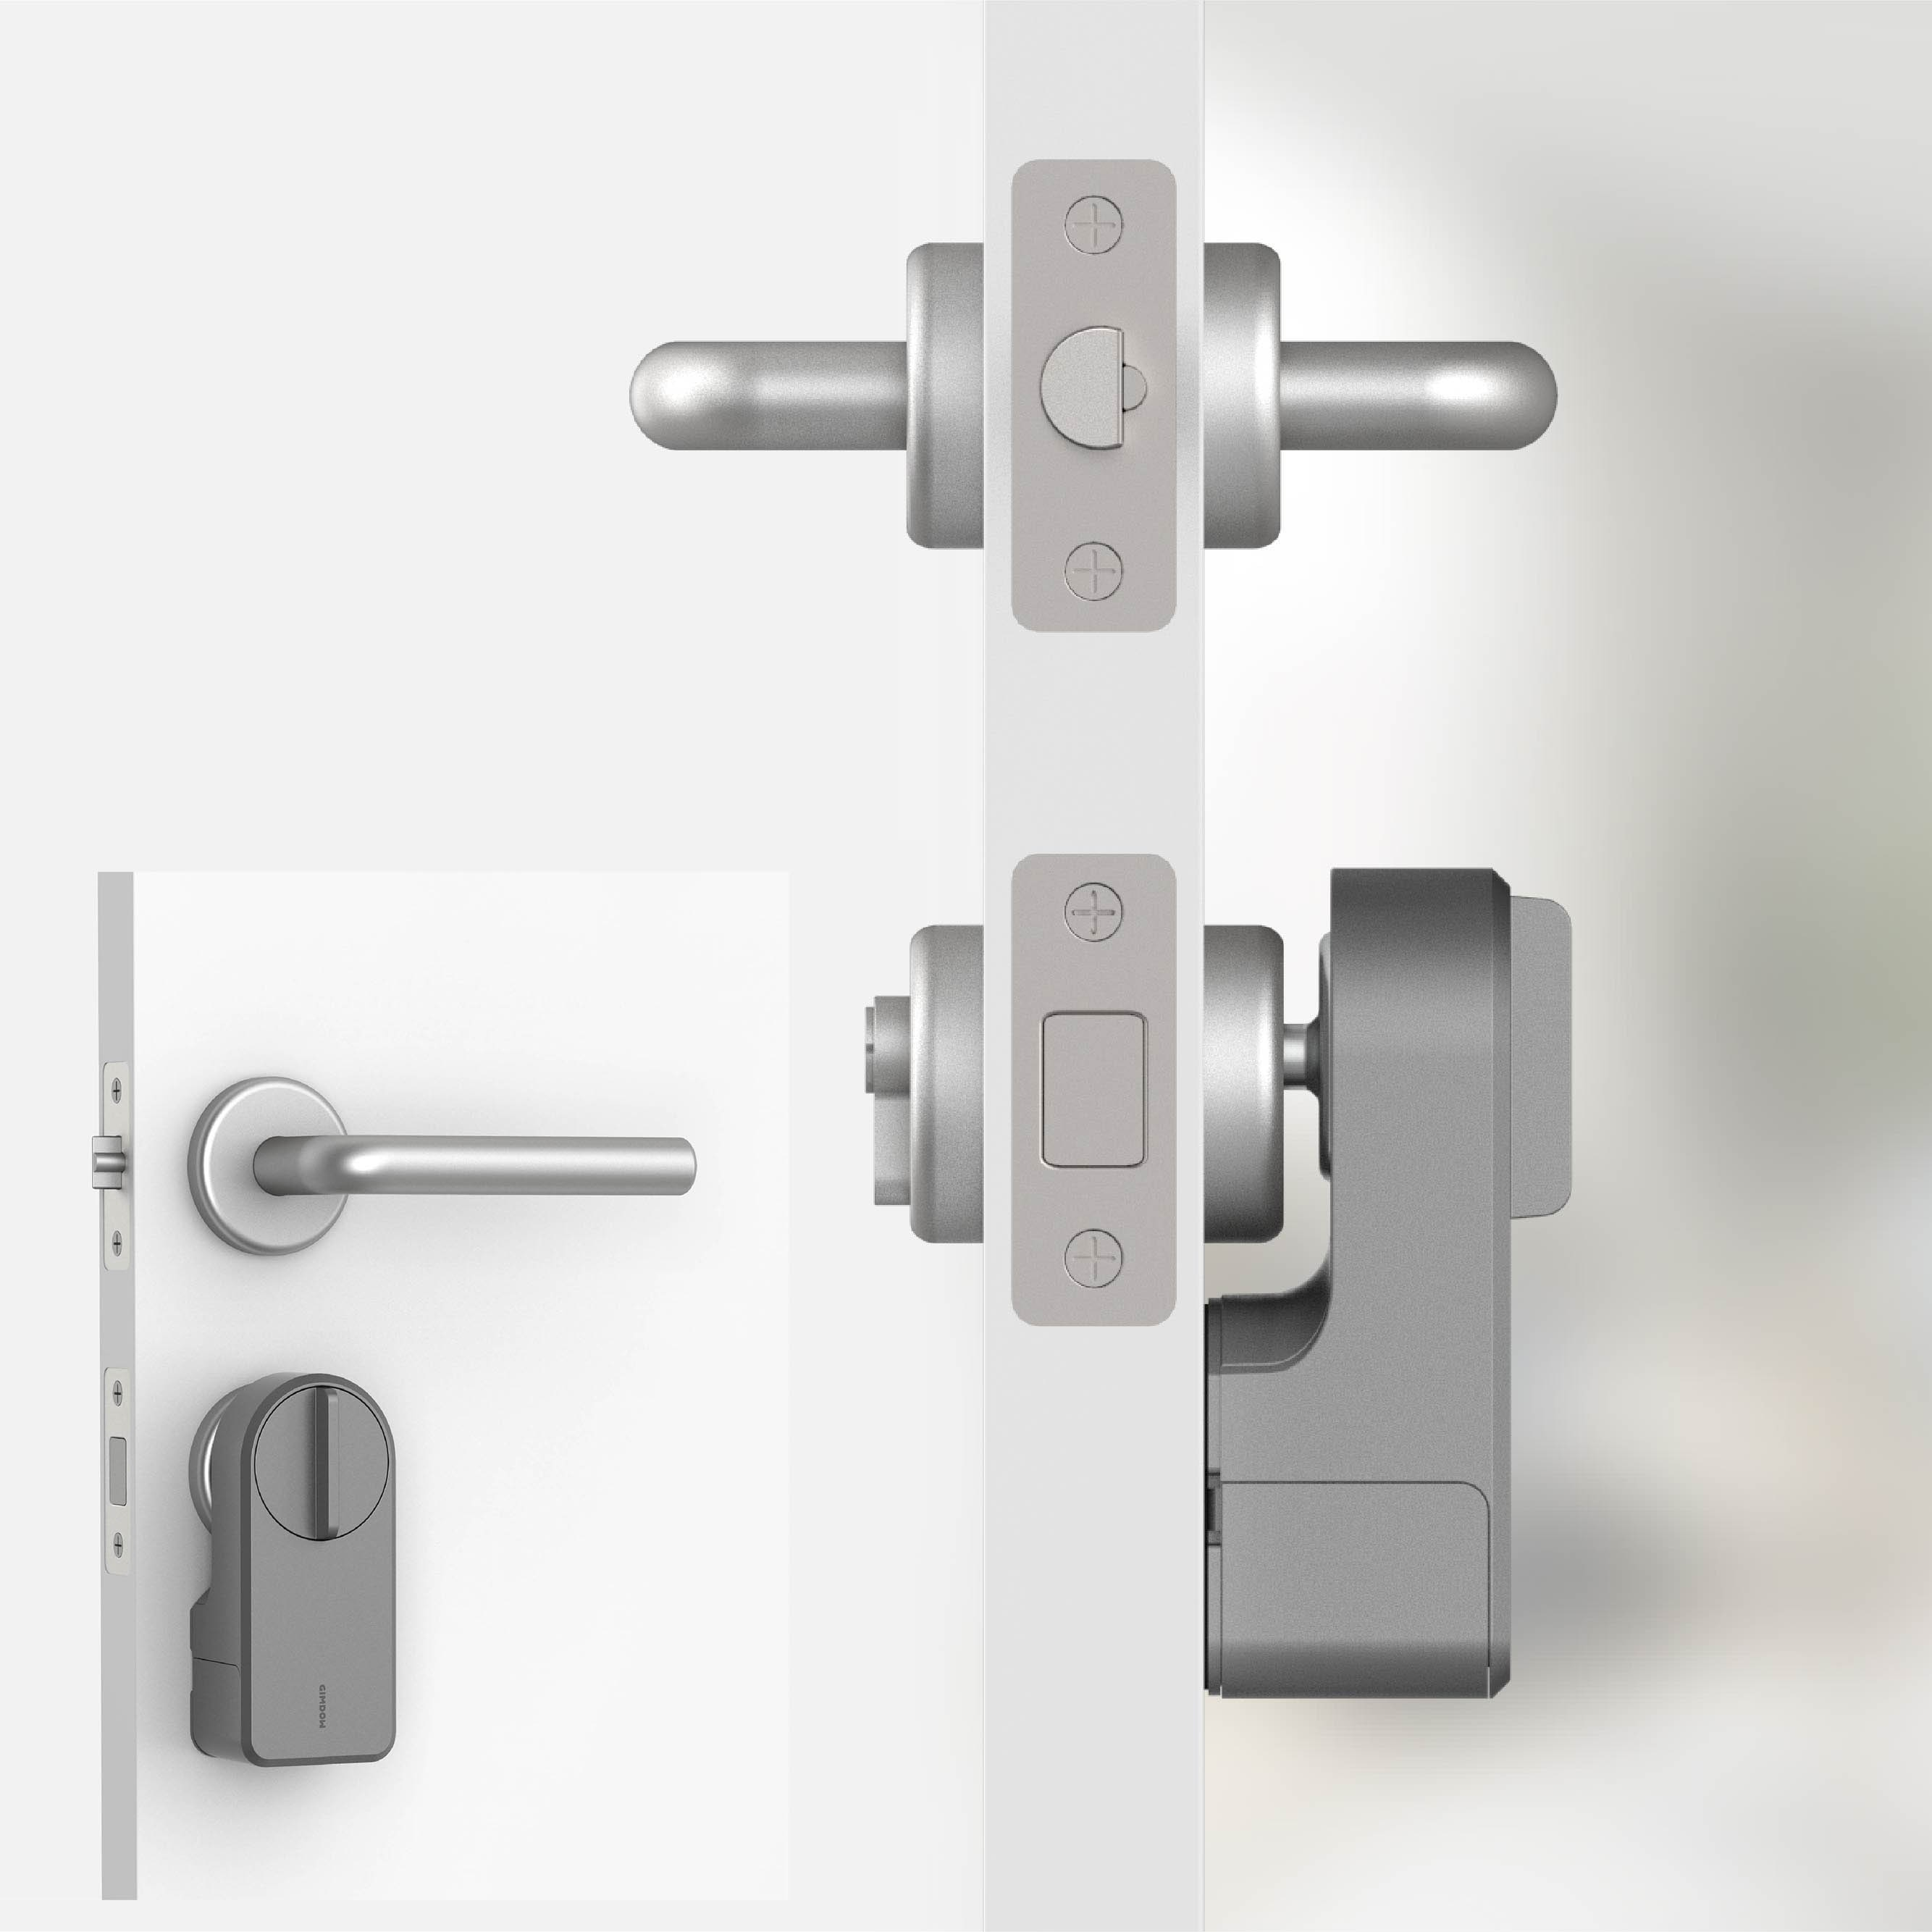 Get GIMDOW A3 Smart Door Electric Lock APP control buletooth Sticker lock safe electronic lock keylessentry door lock smart